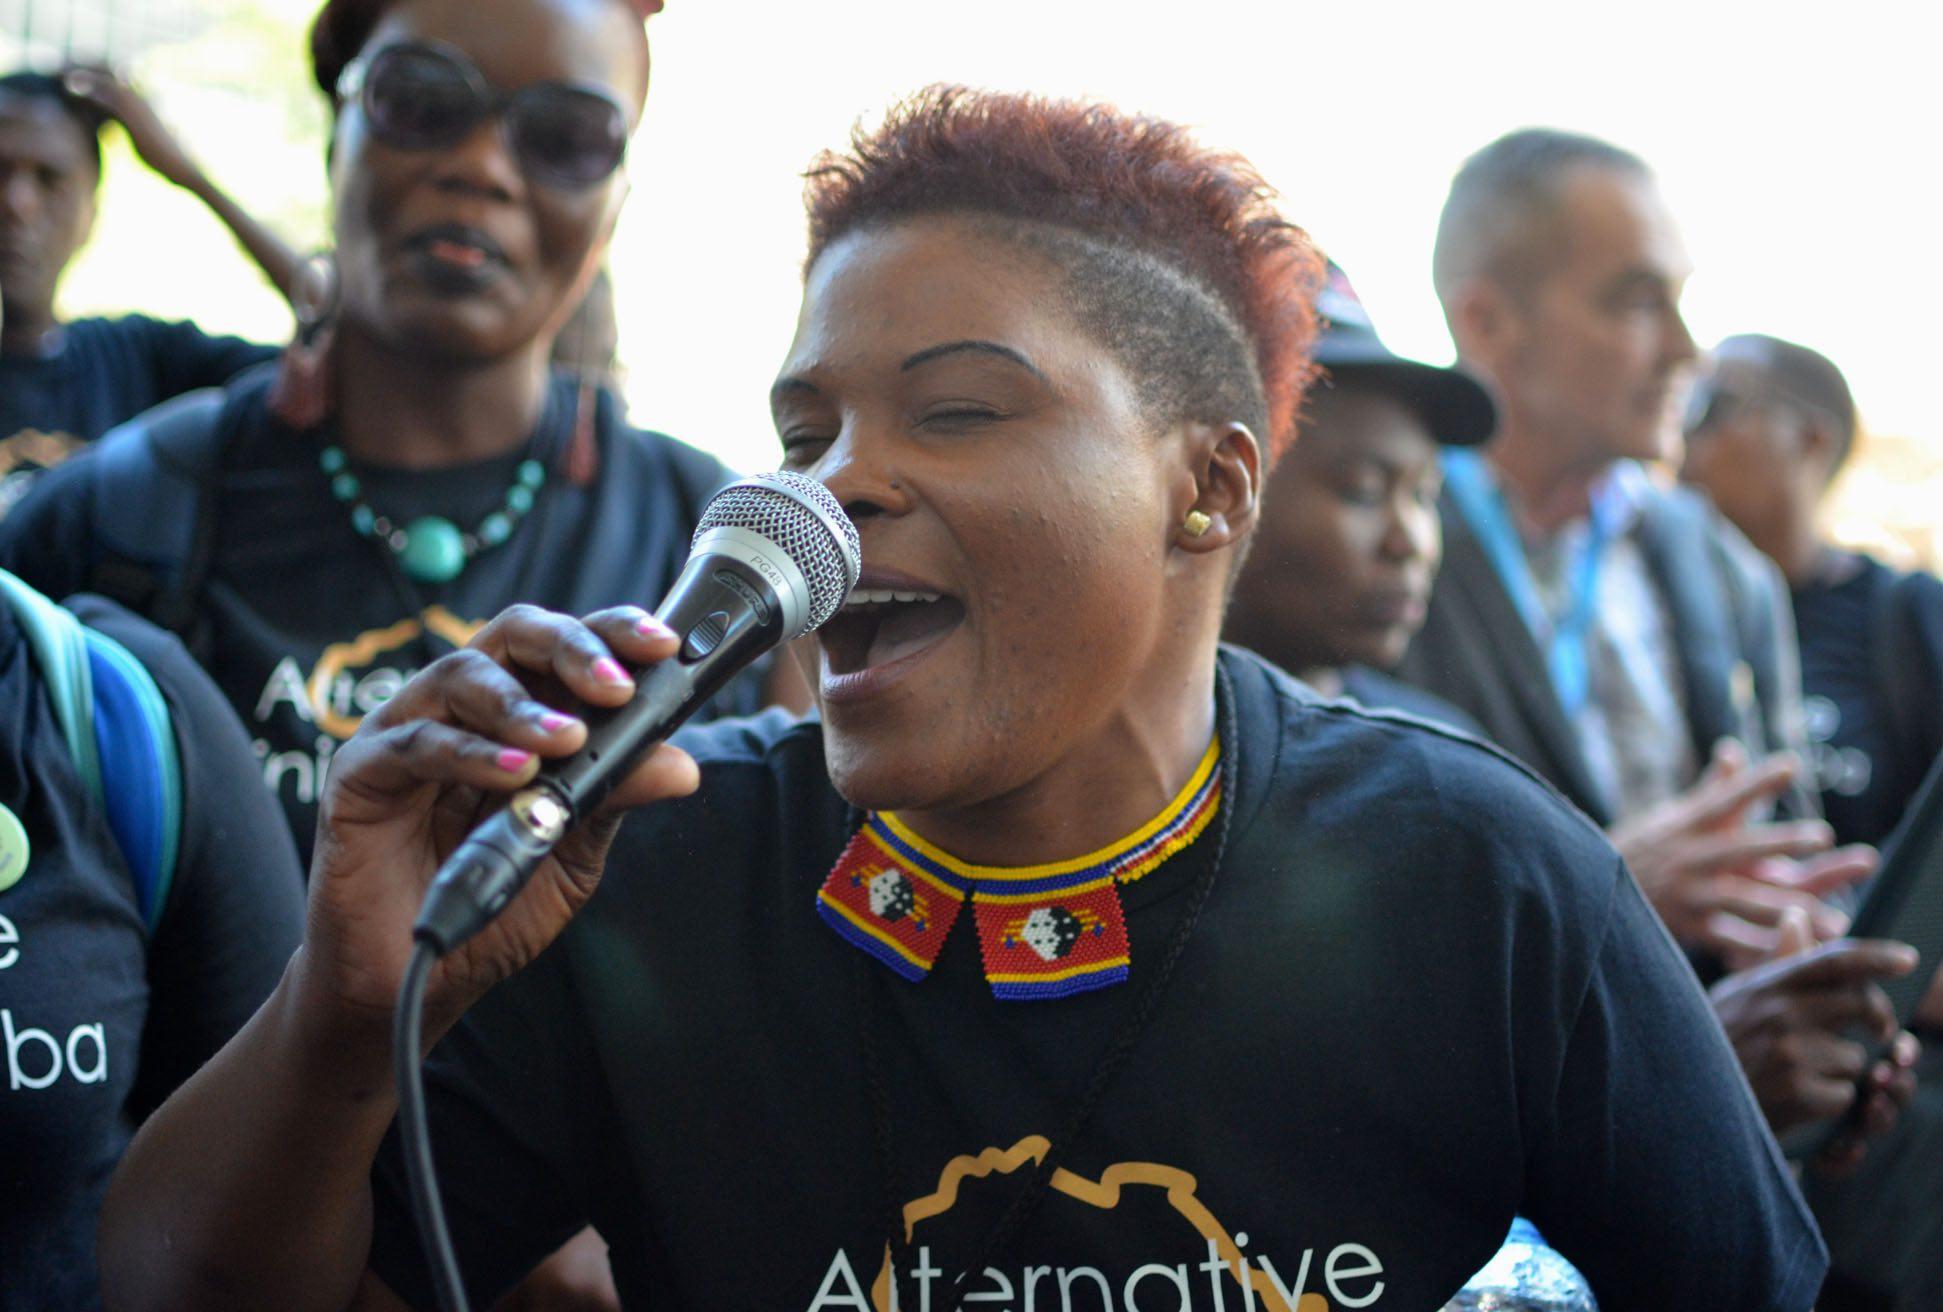 Singer at Alternative Mining Indaba. Photos: Mark Olalde